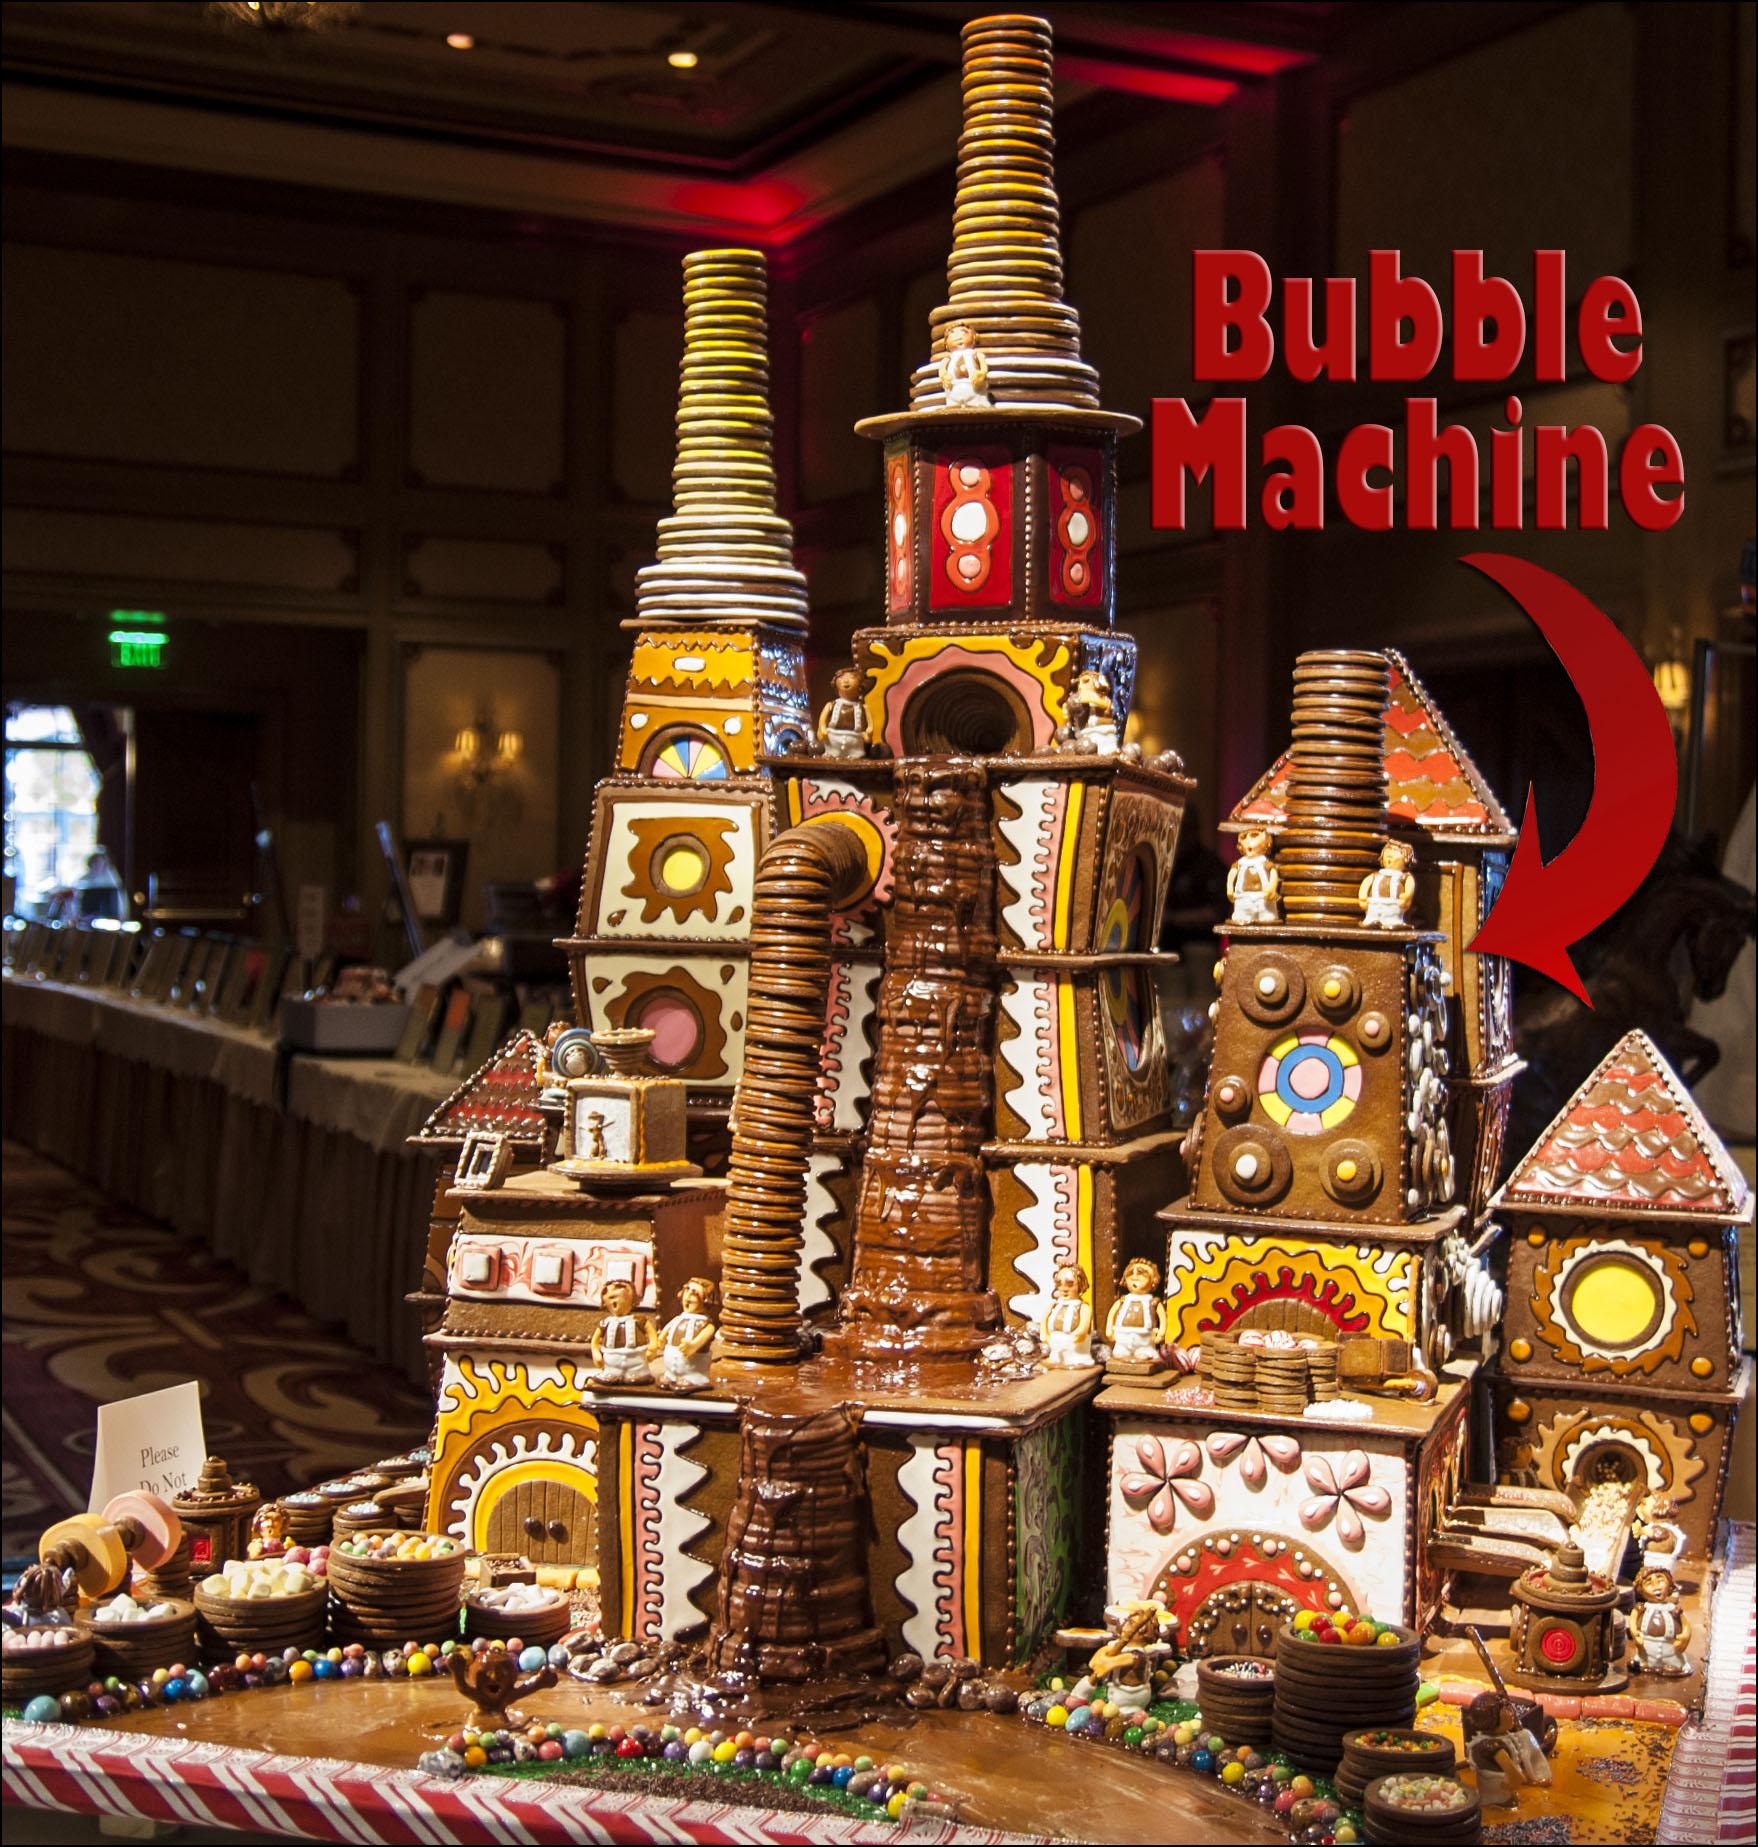 Gingerbread House Bubble Machine